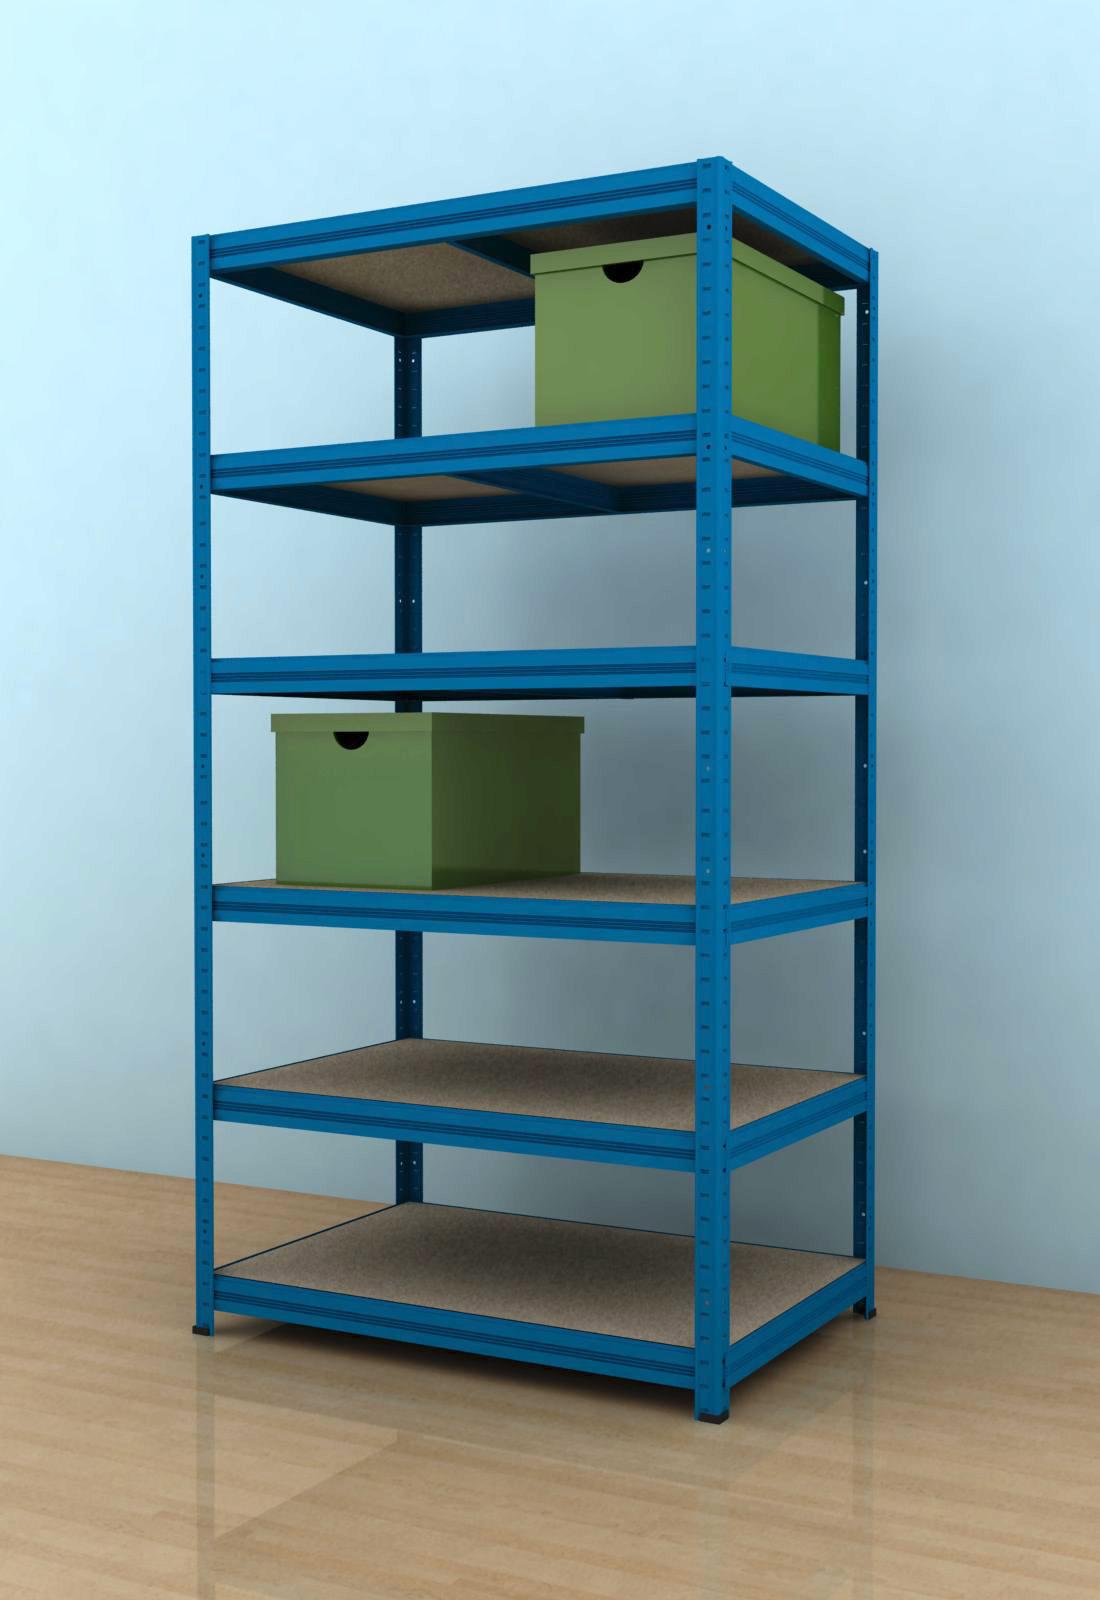 Kovový regál Futur 1800x900x600/6, modrá (modrá, 275 kg/pol., 6 výztuh )